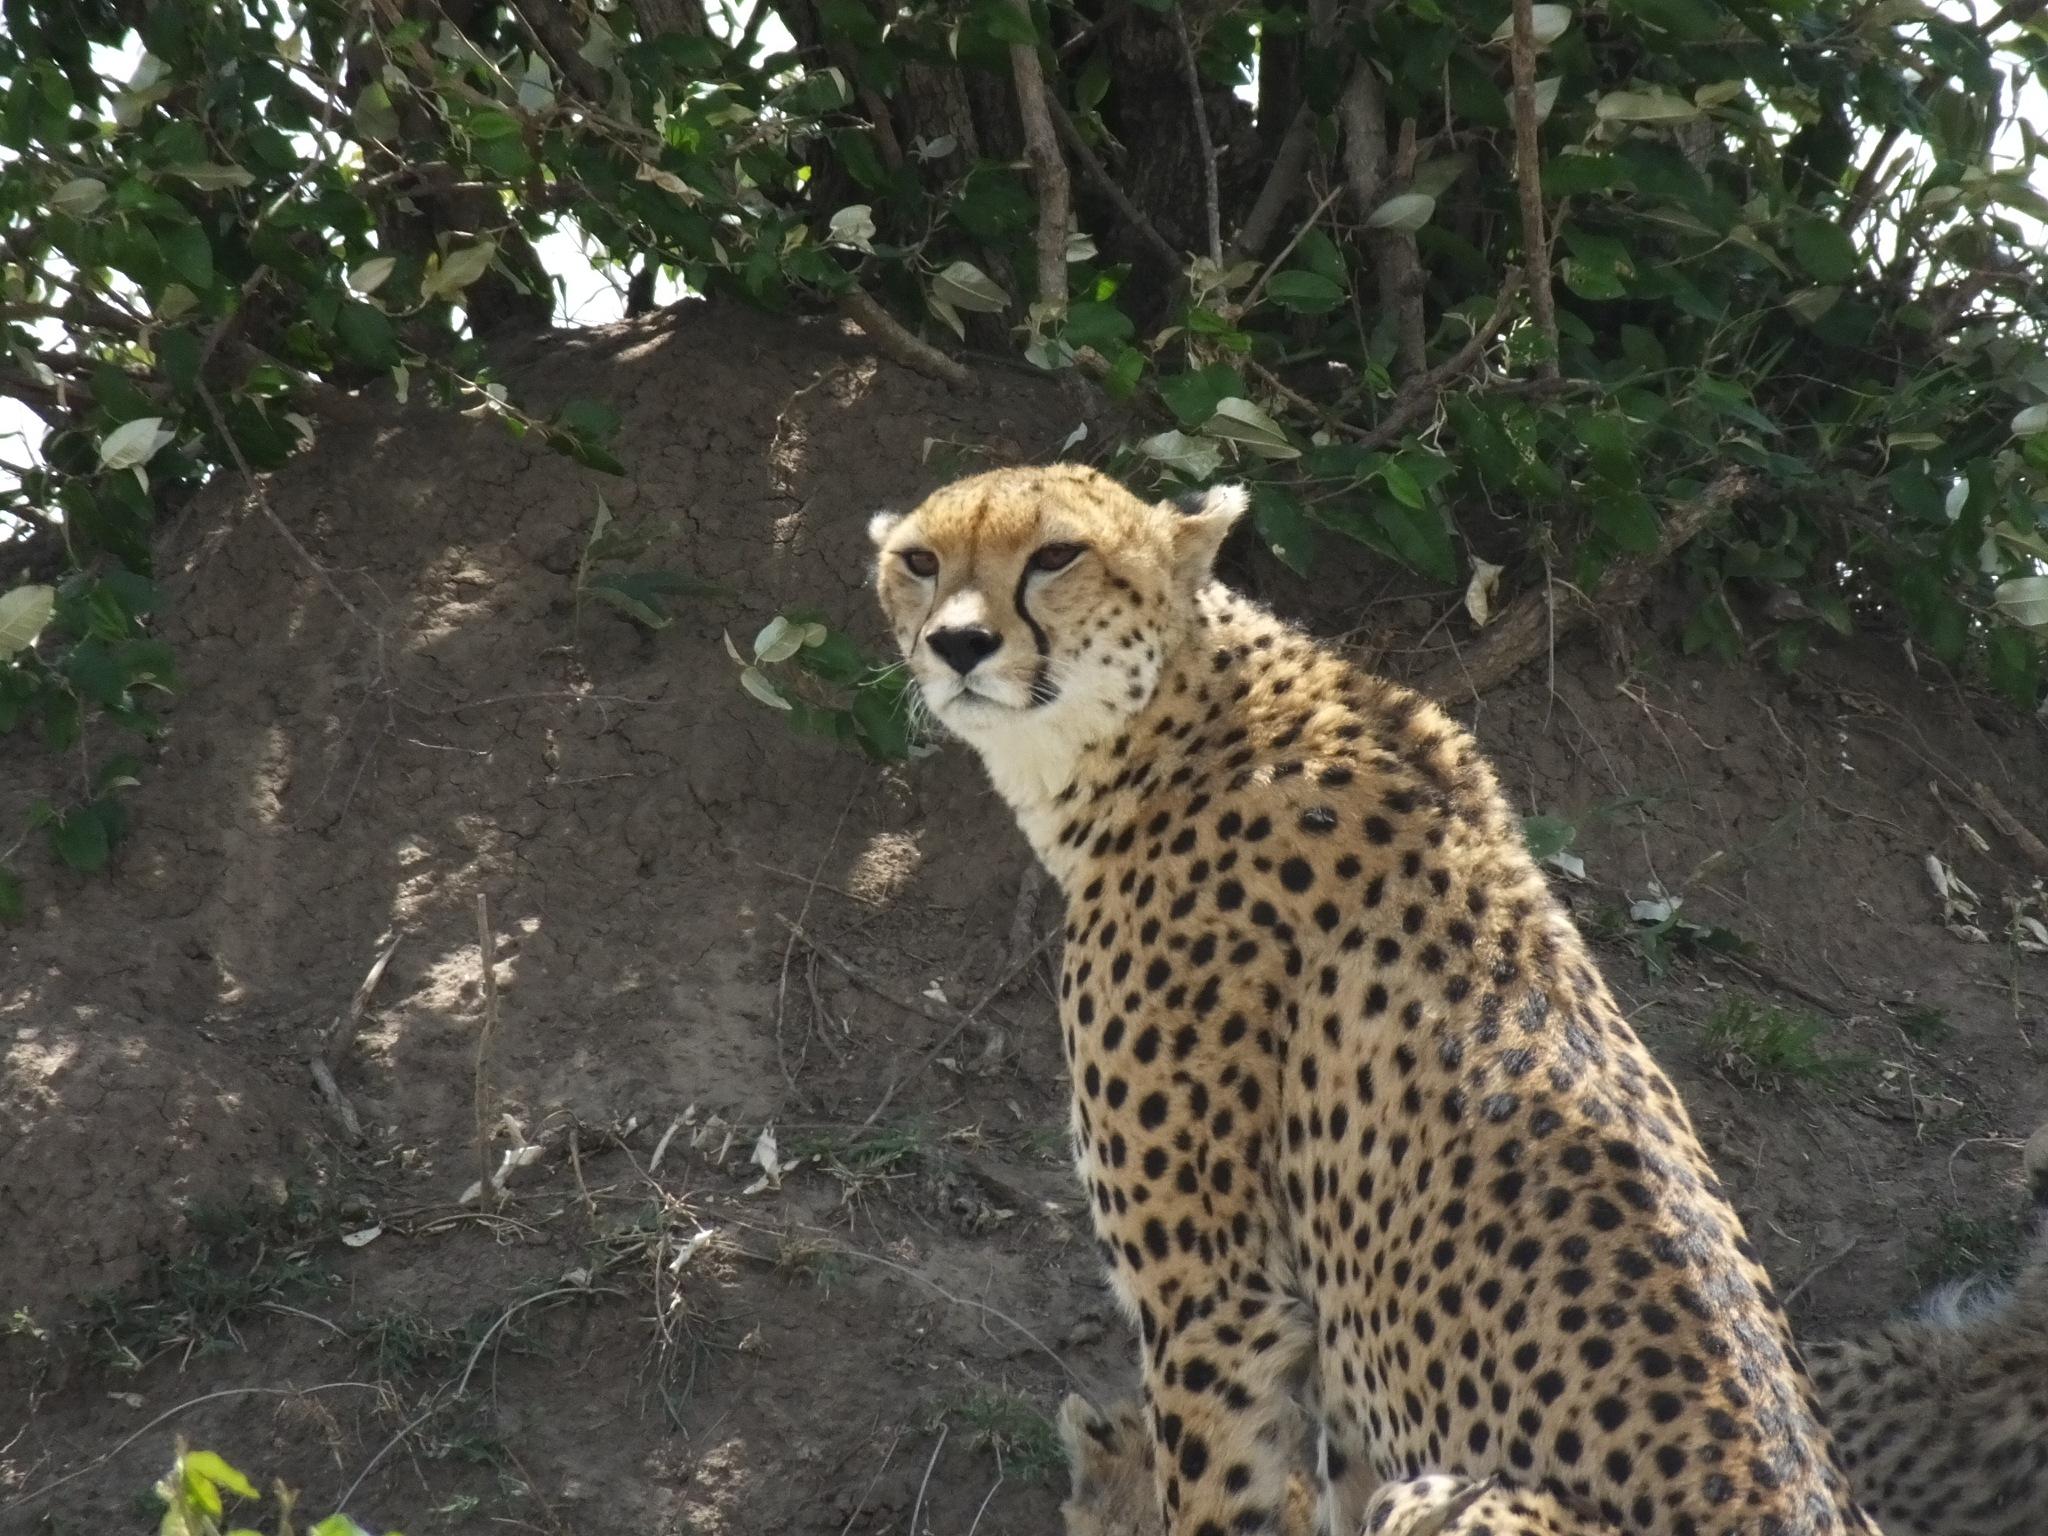 Cheetah by Pyoungyong